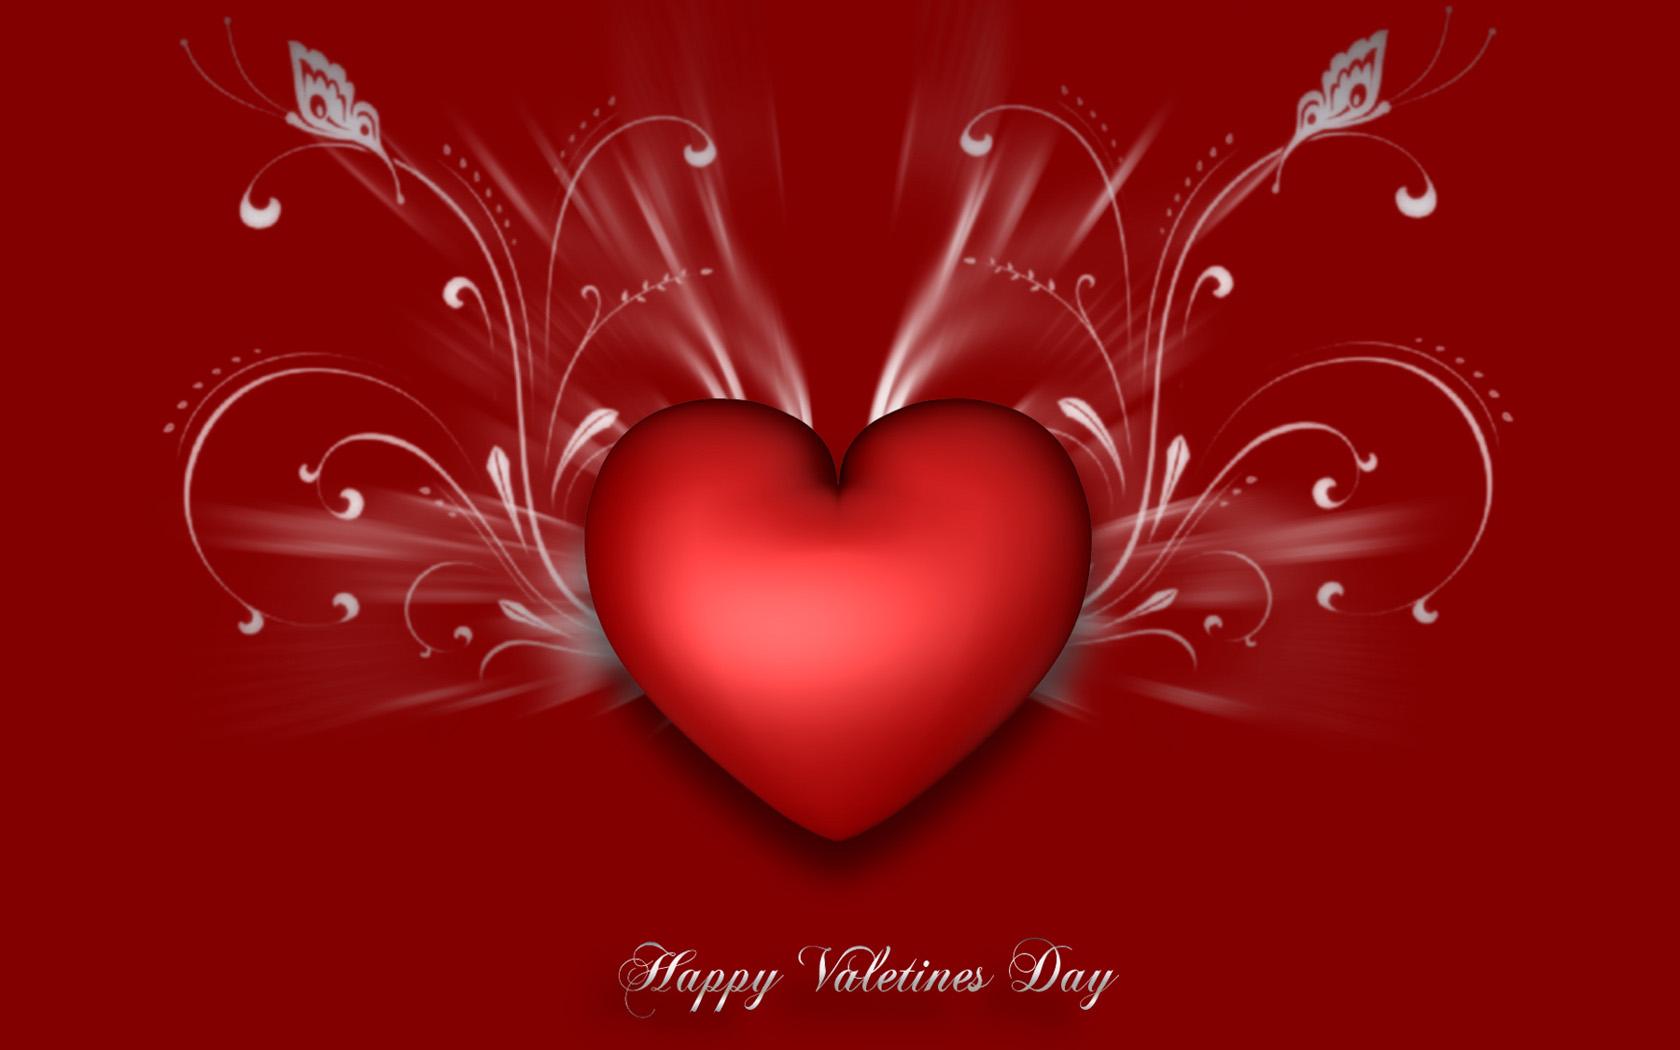 free valentine day wallpaper wallpup com